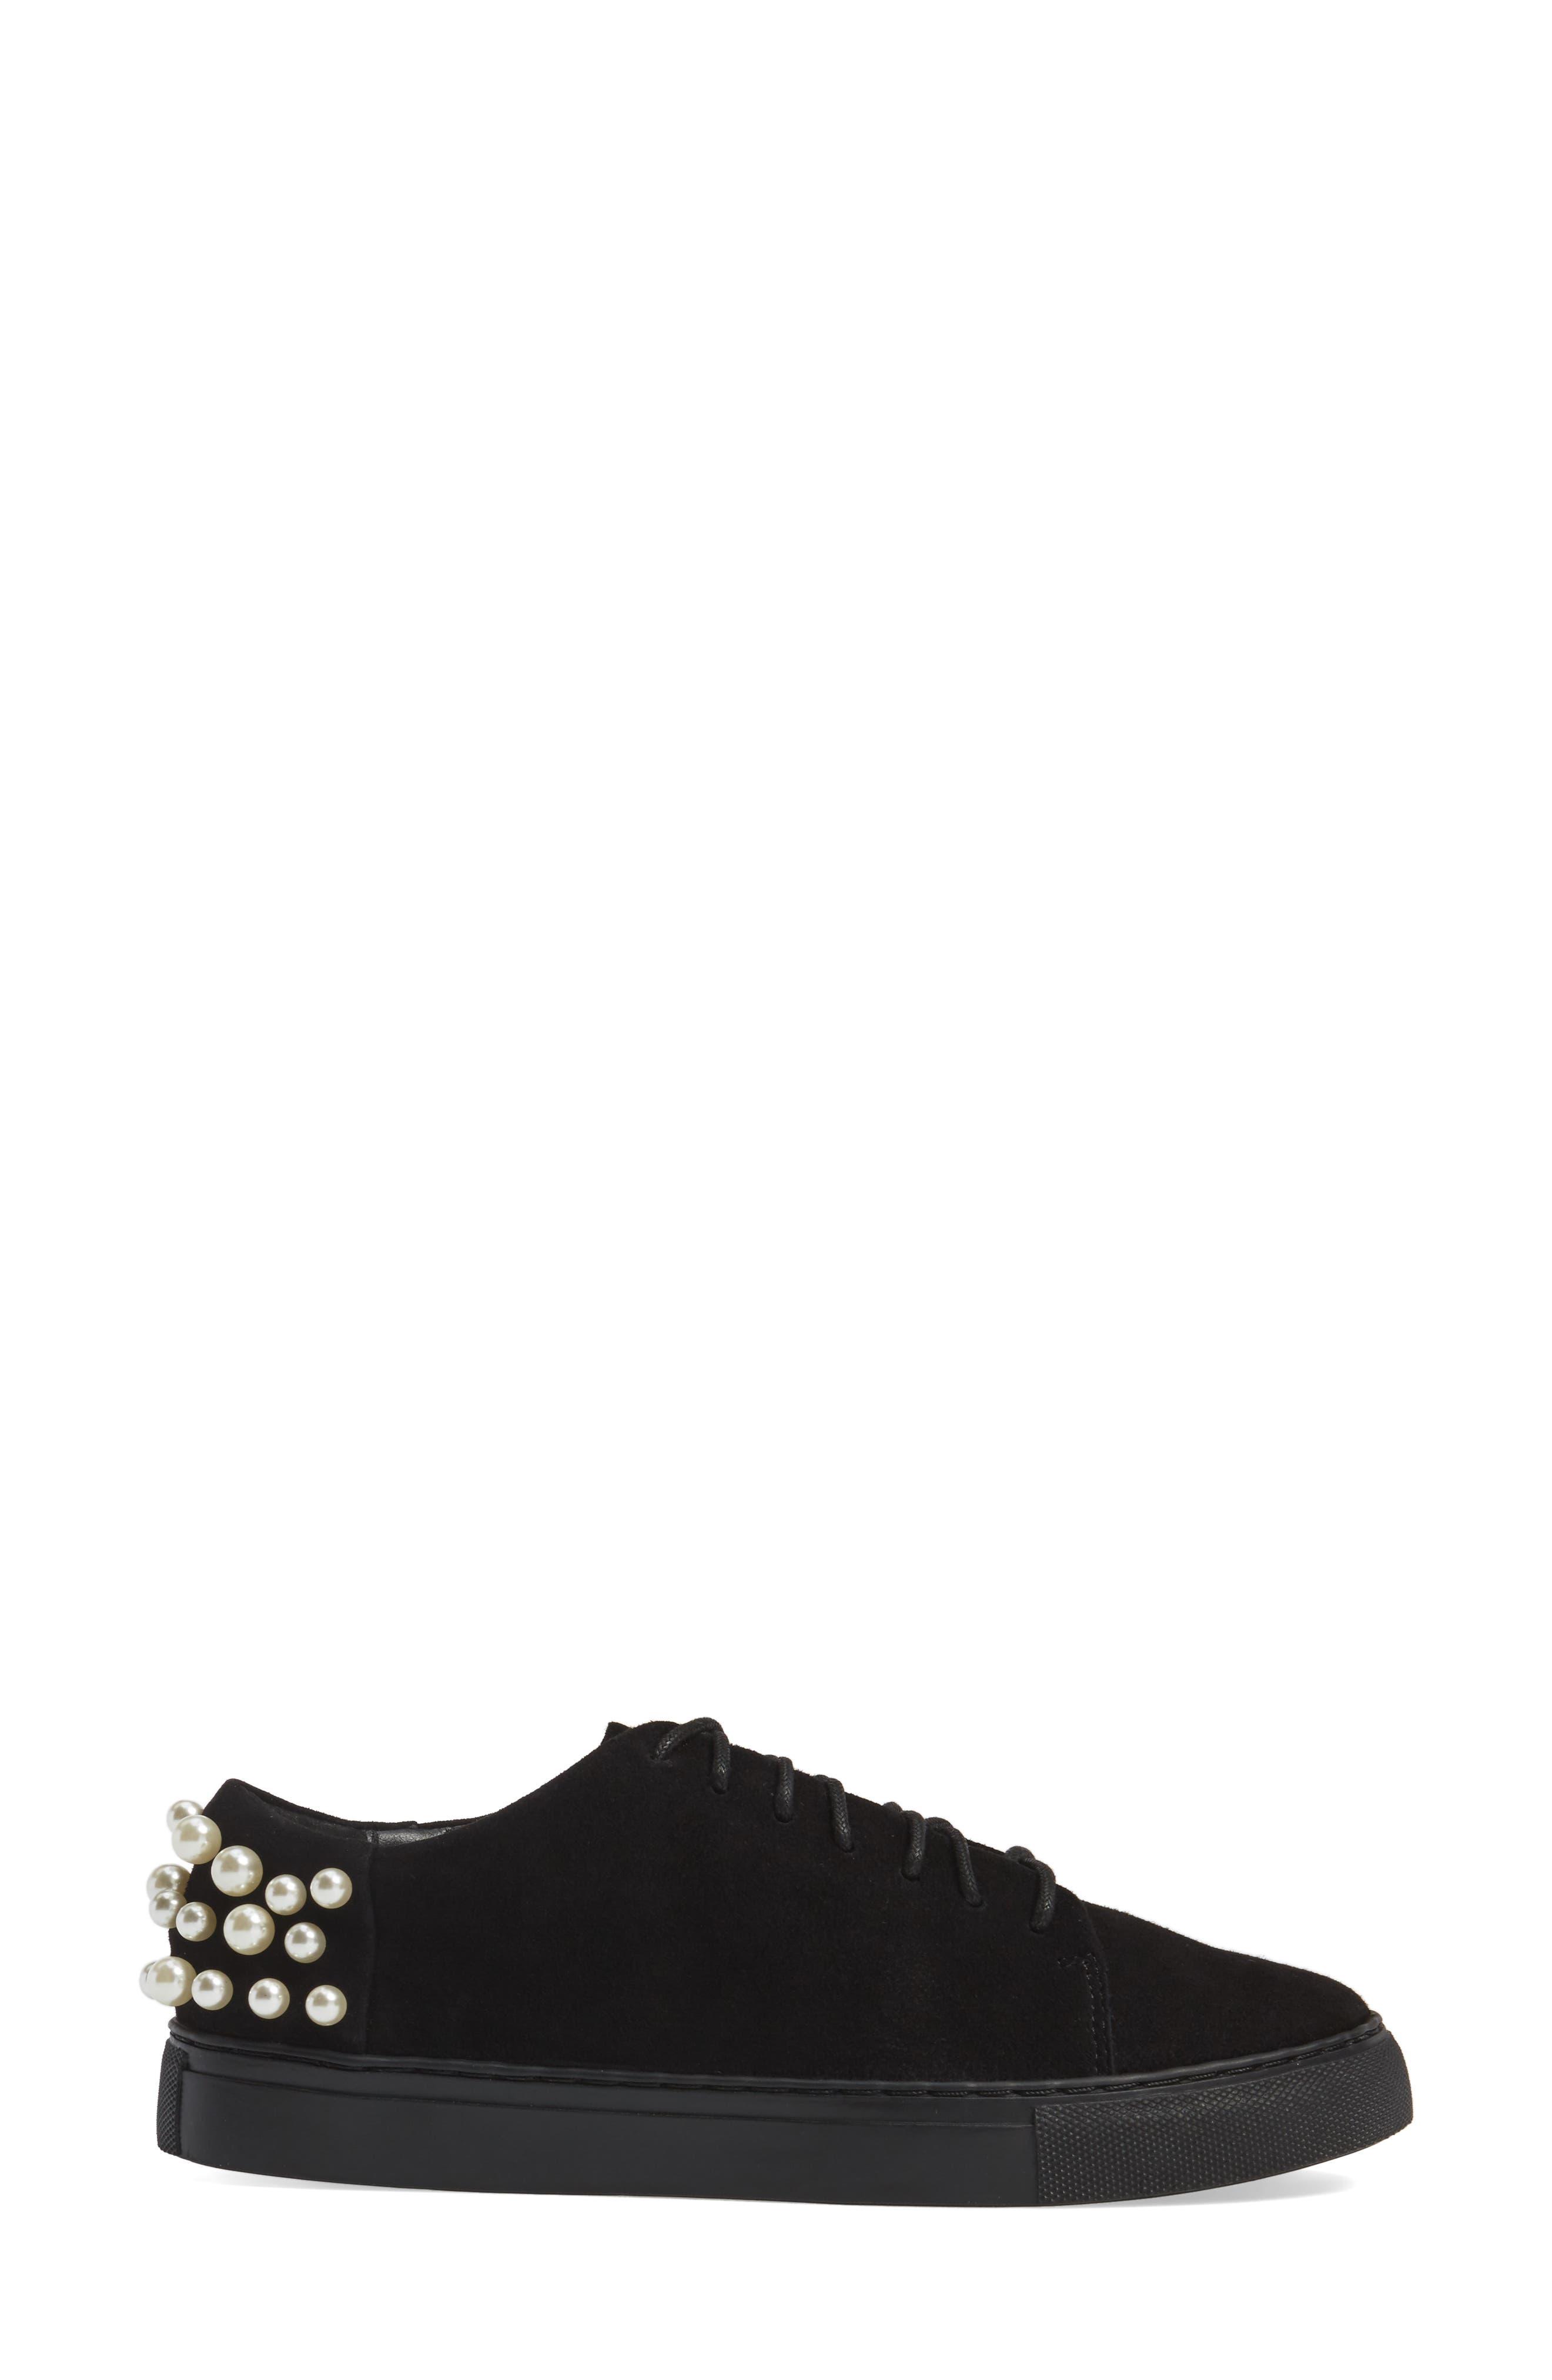 Haig Embellished Sneaker,                             Alternate thumbnail 3, color,                             Black